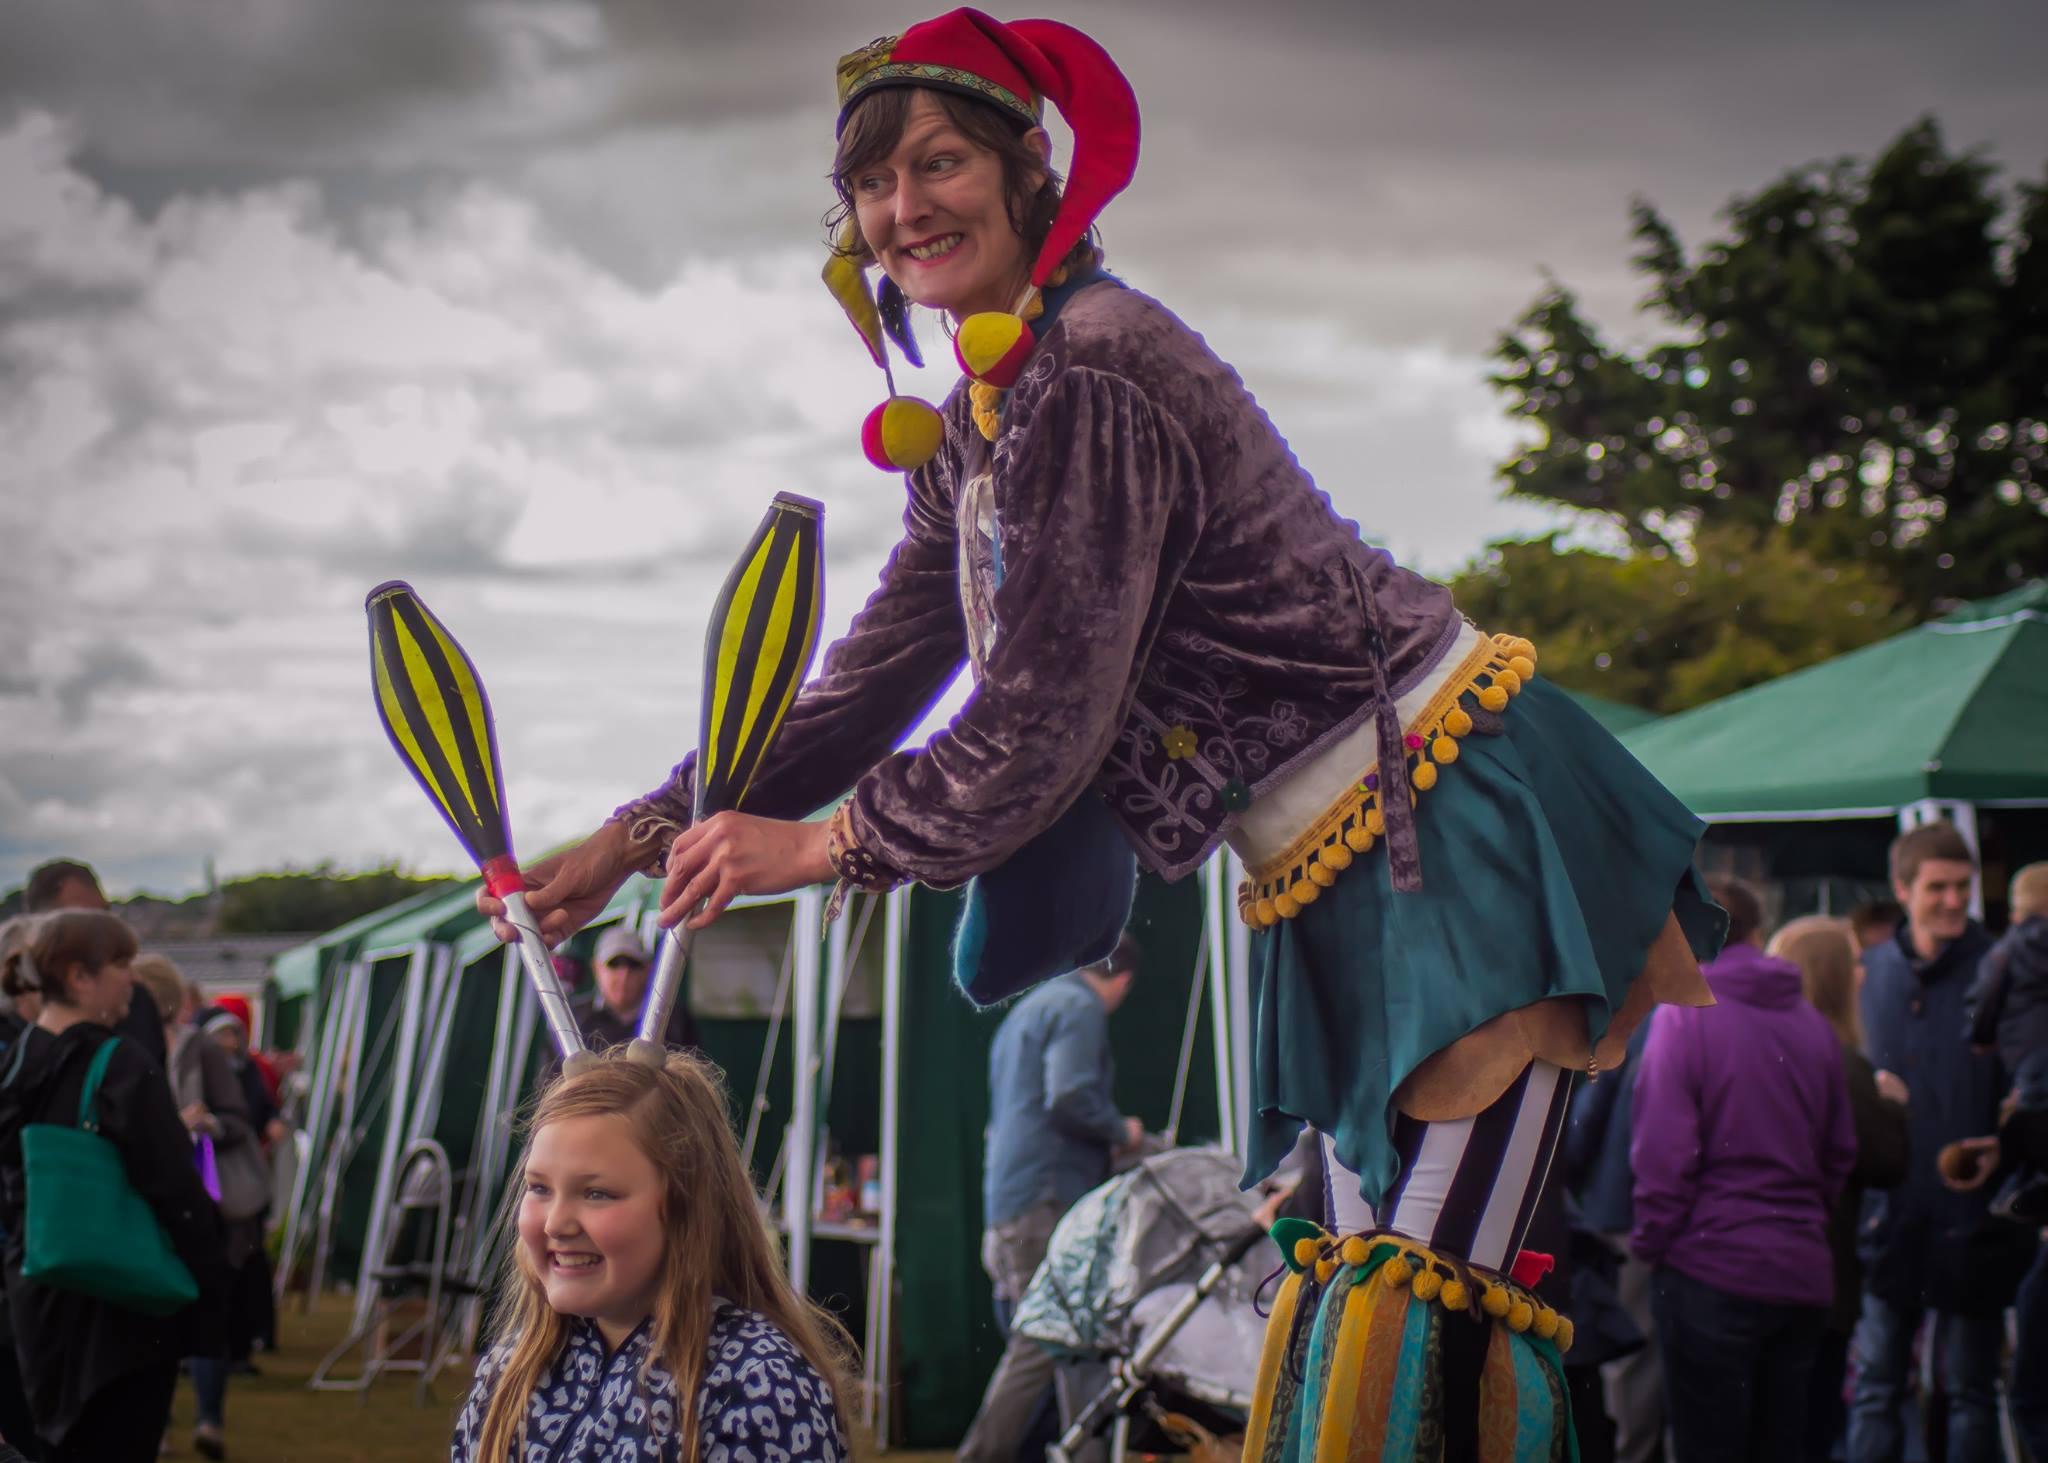 crowdpuller/Circus_scotland_stiltwalker_stiltwalking_stilts_juggling_jester_2017.jpg